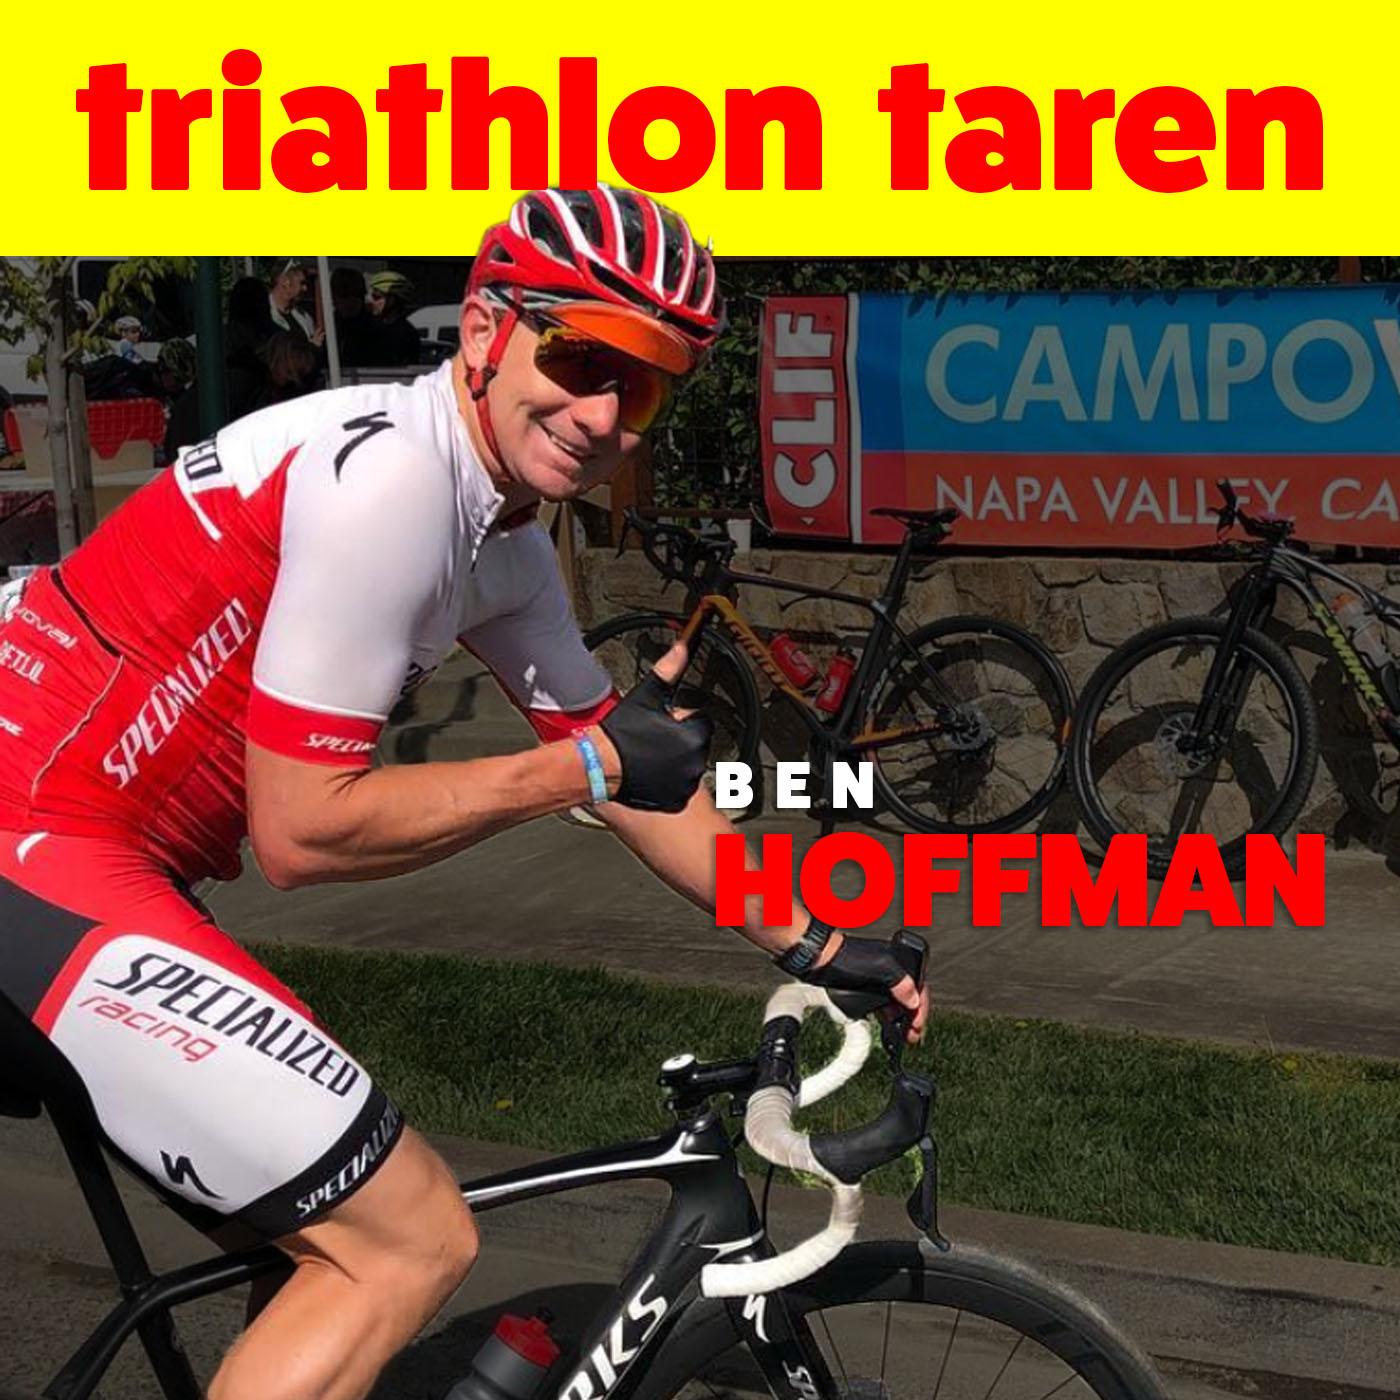 Pro triathlete Ben Hoffman | USA's best chance to win Kona